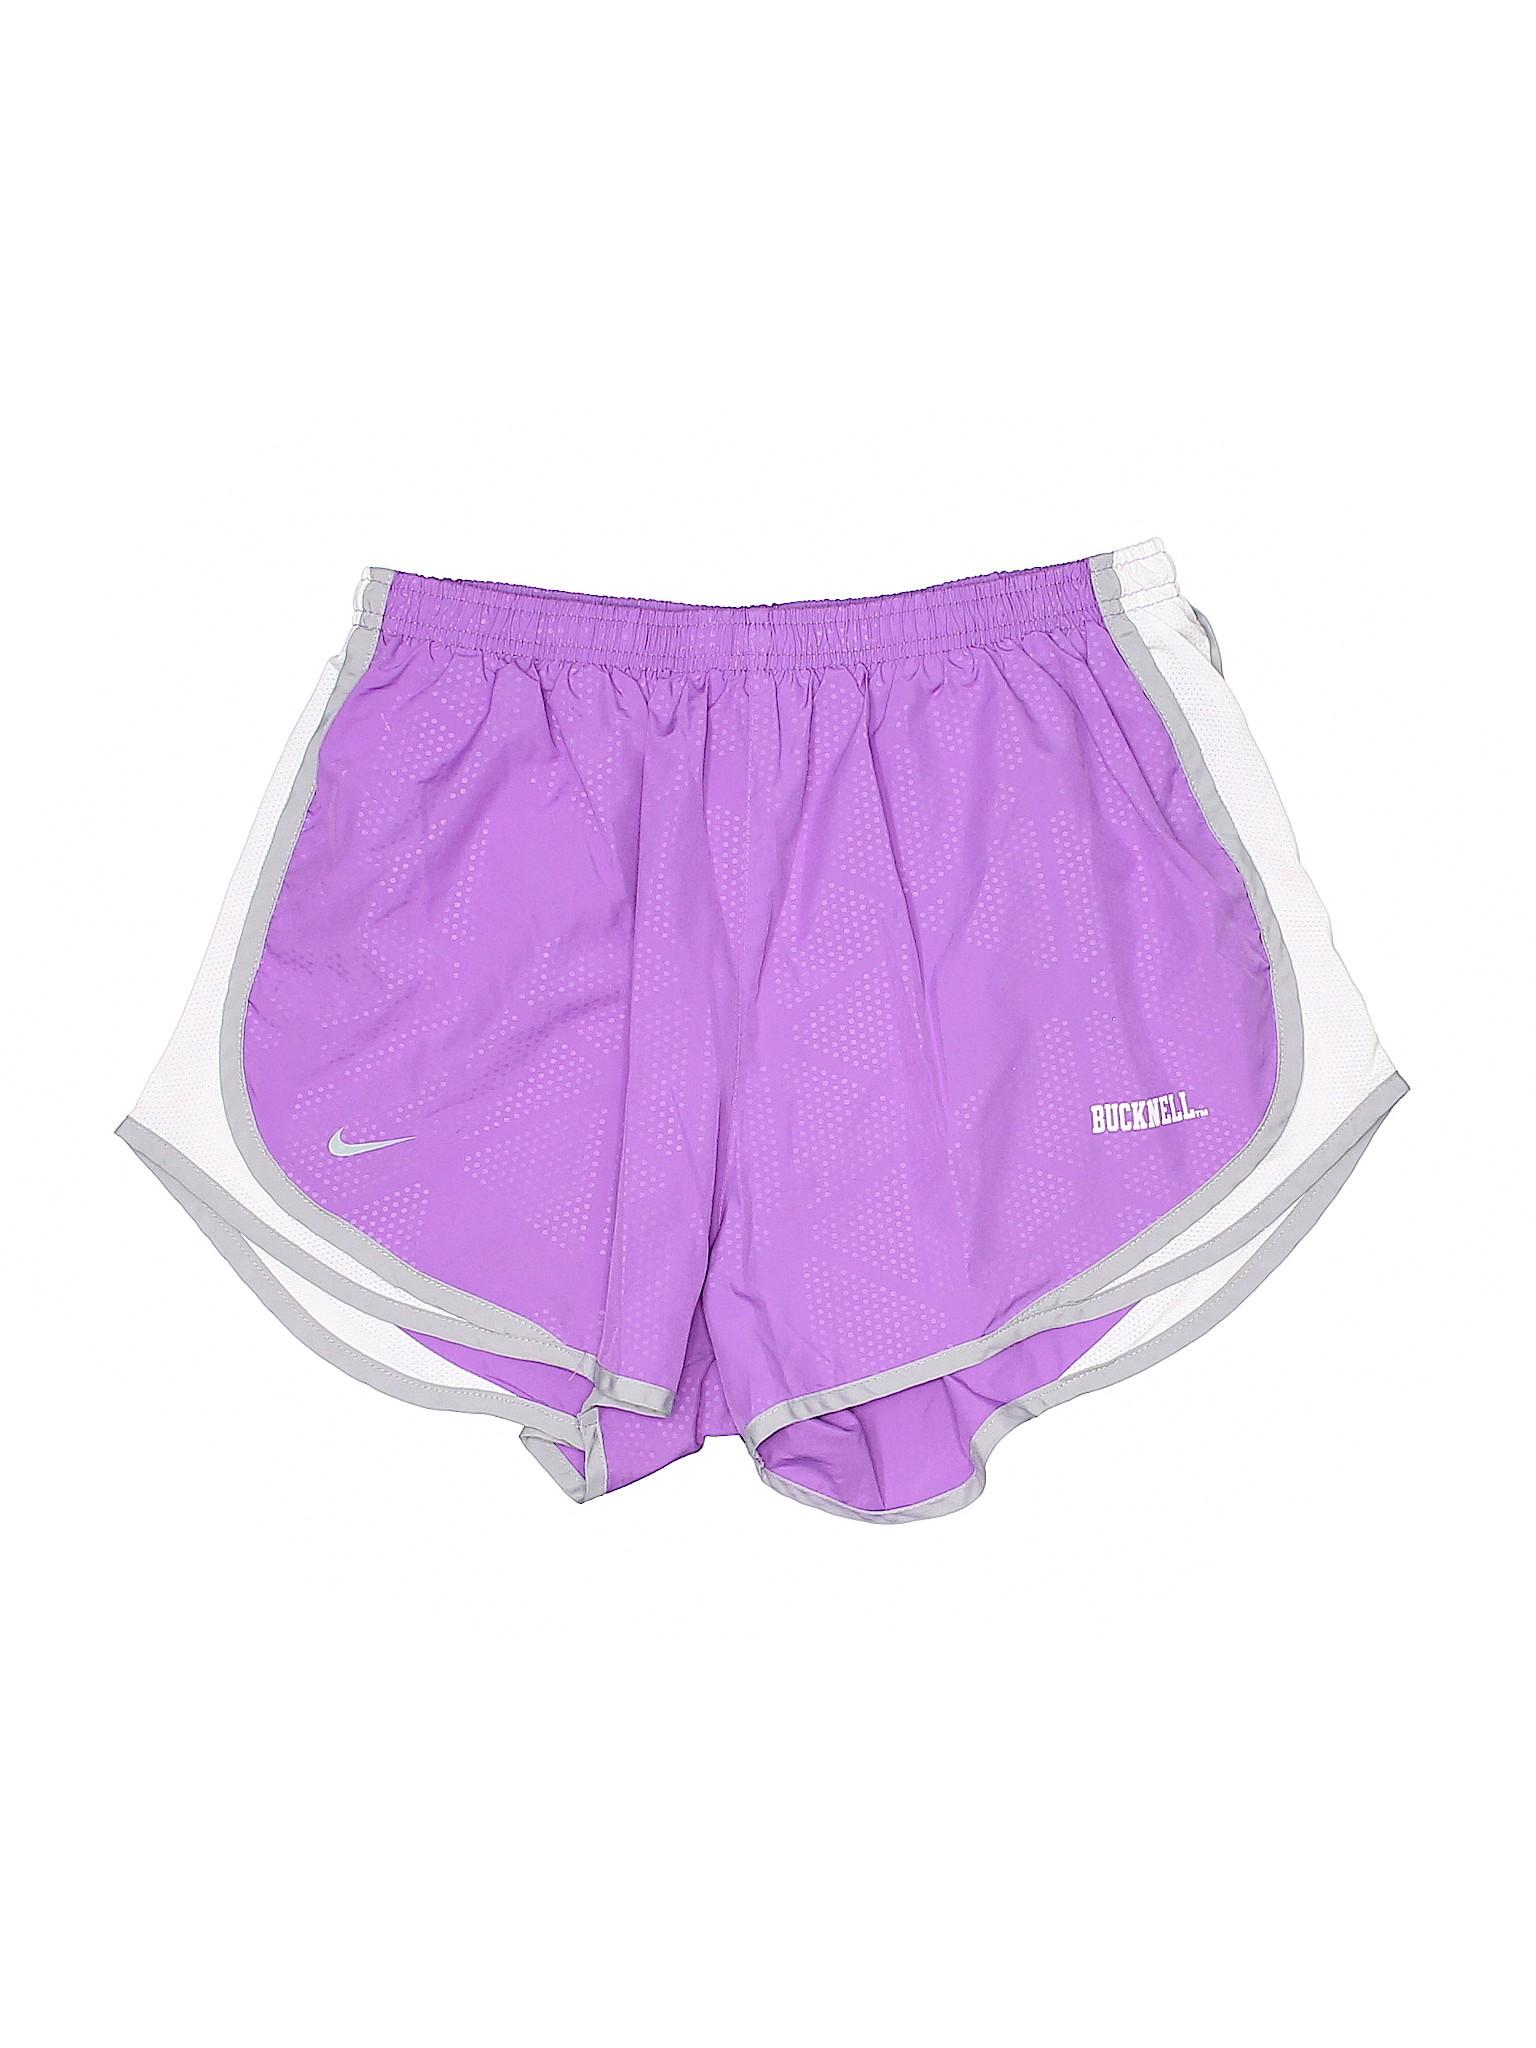 Shorts Nike Leisure winter Leisure Athletic winter wxXxqY4S